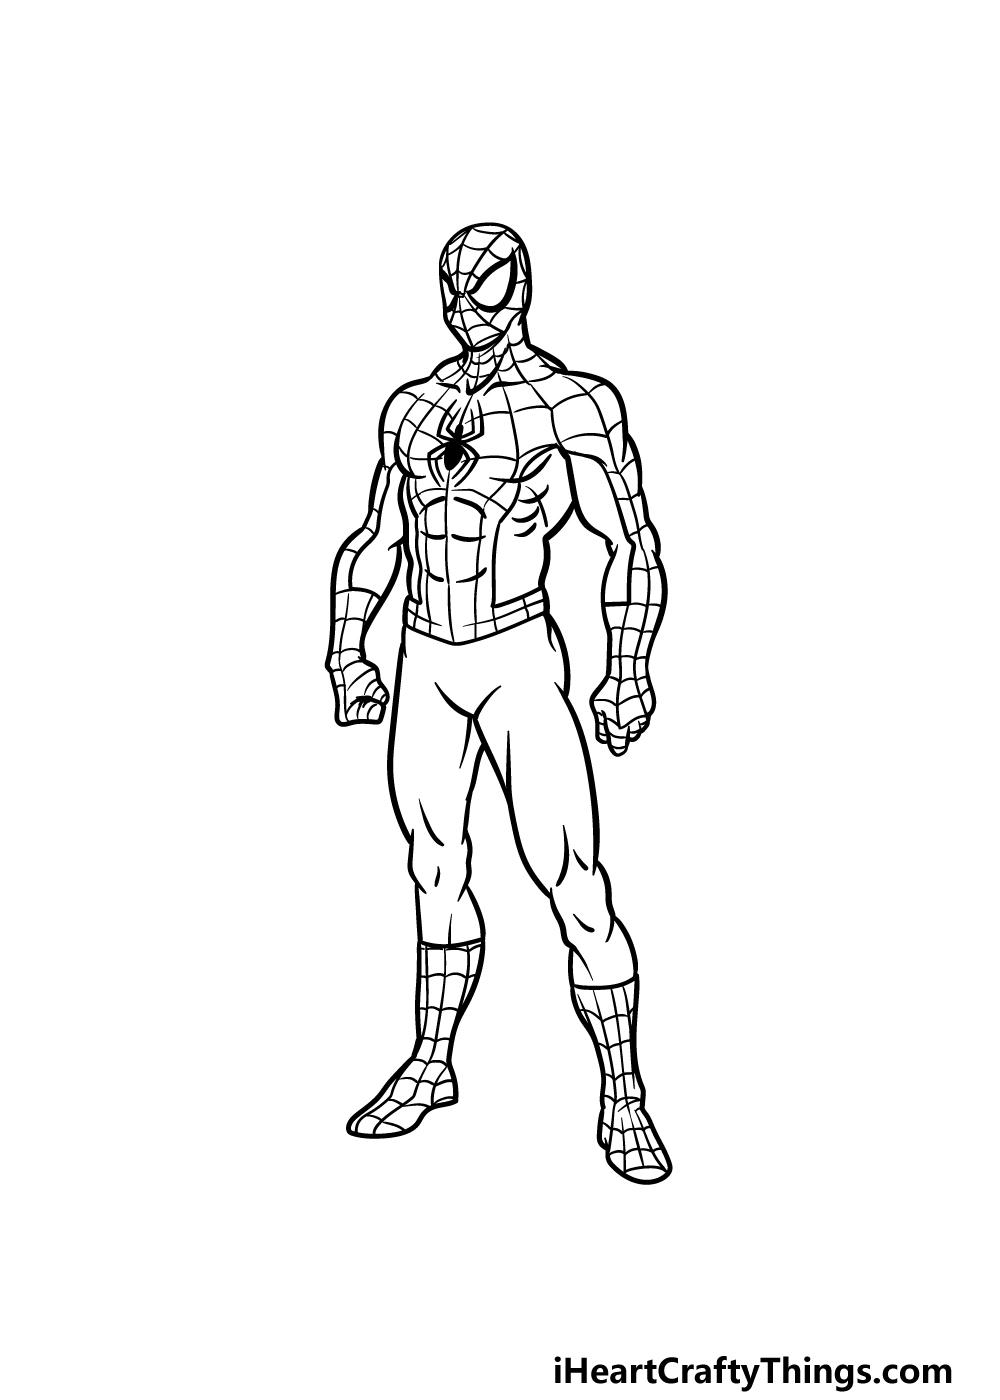 drawing Spiderman step 5